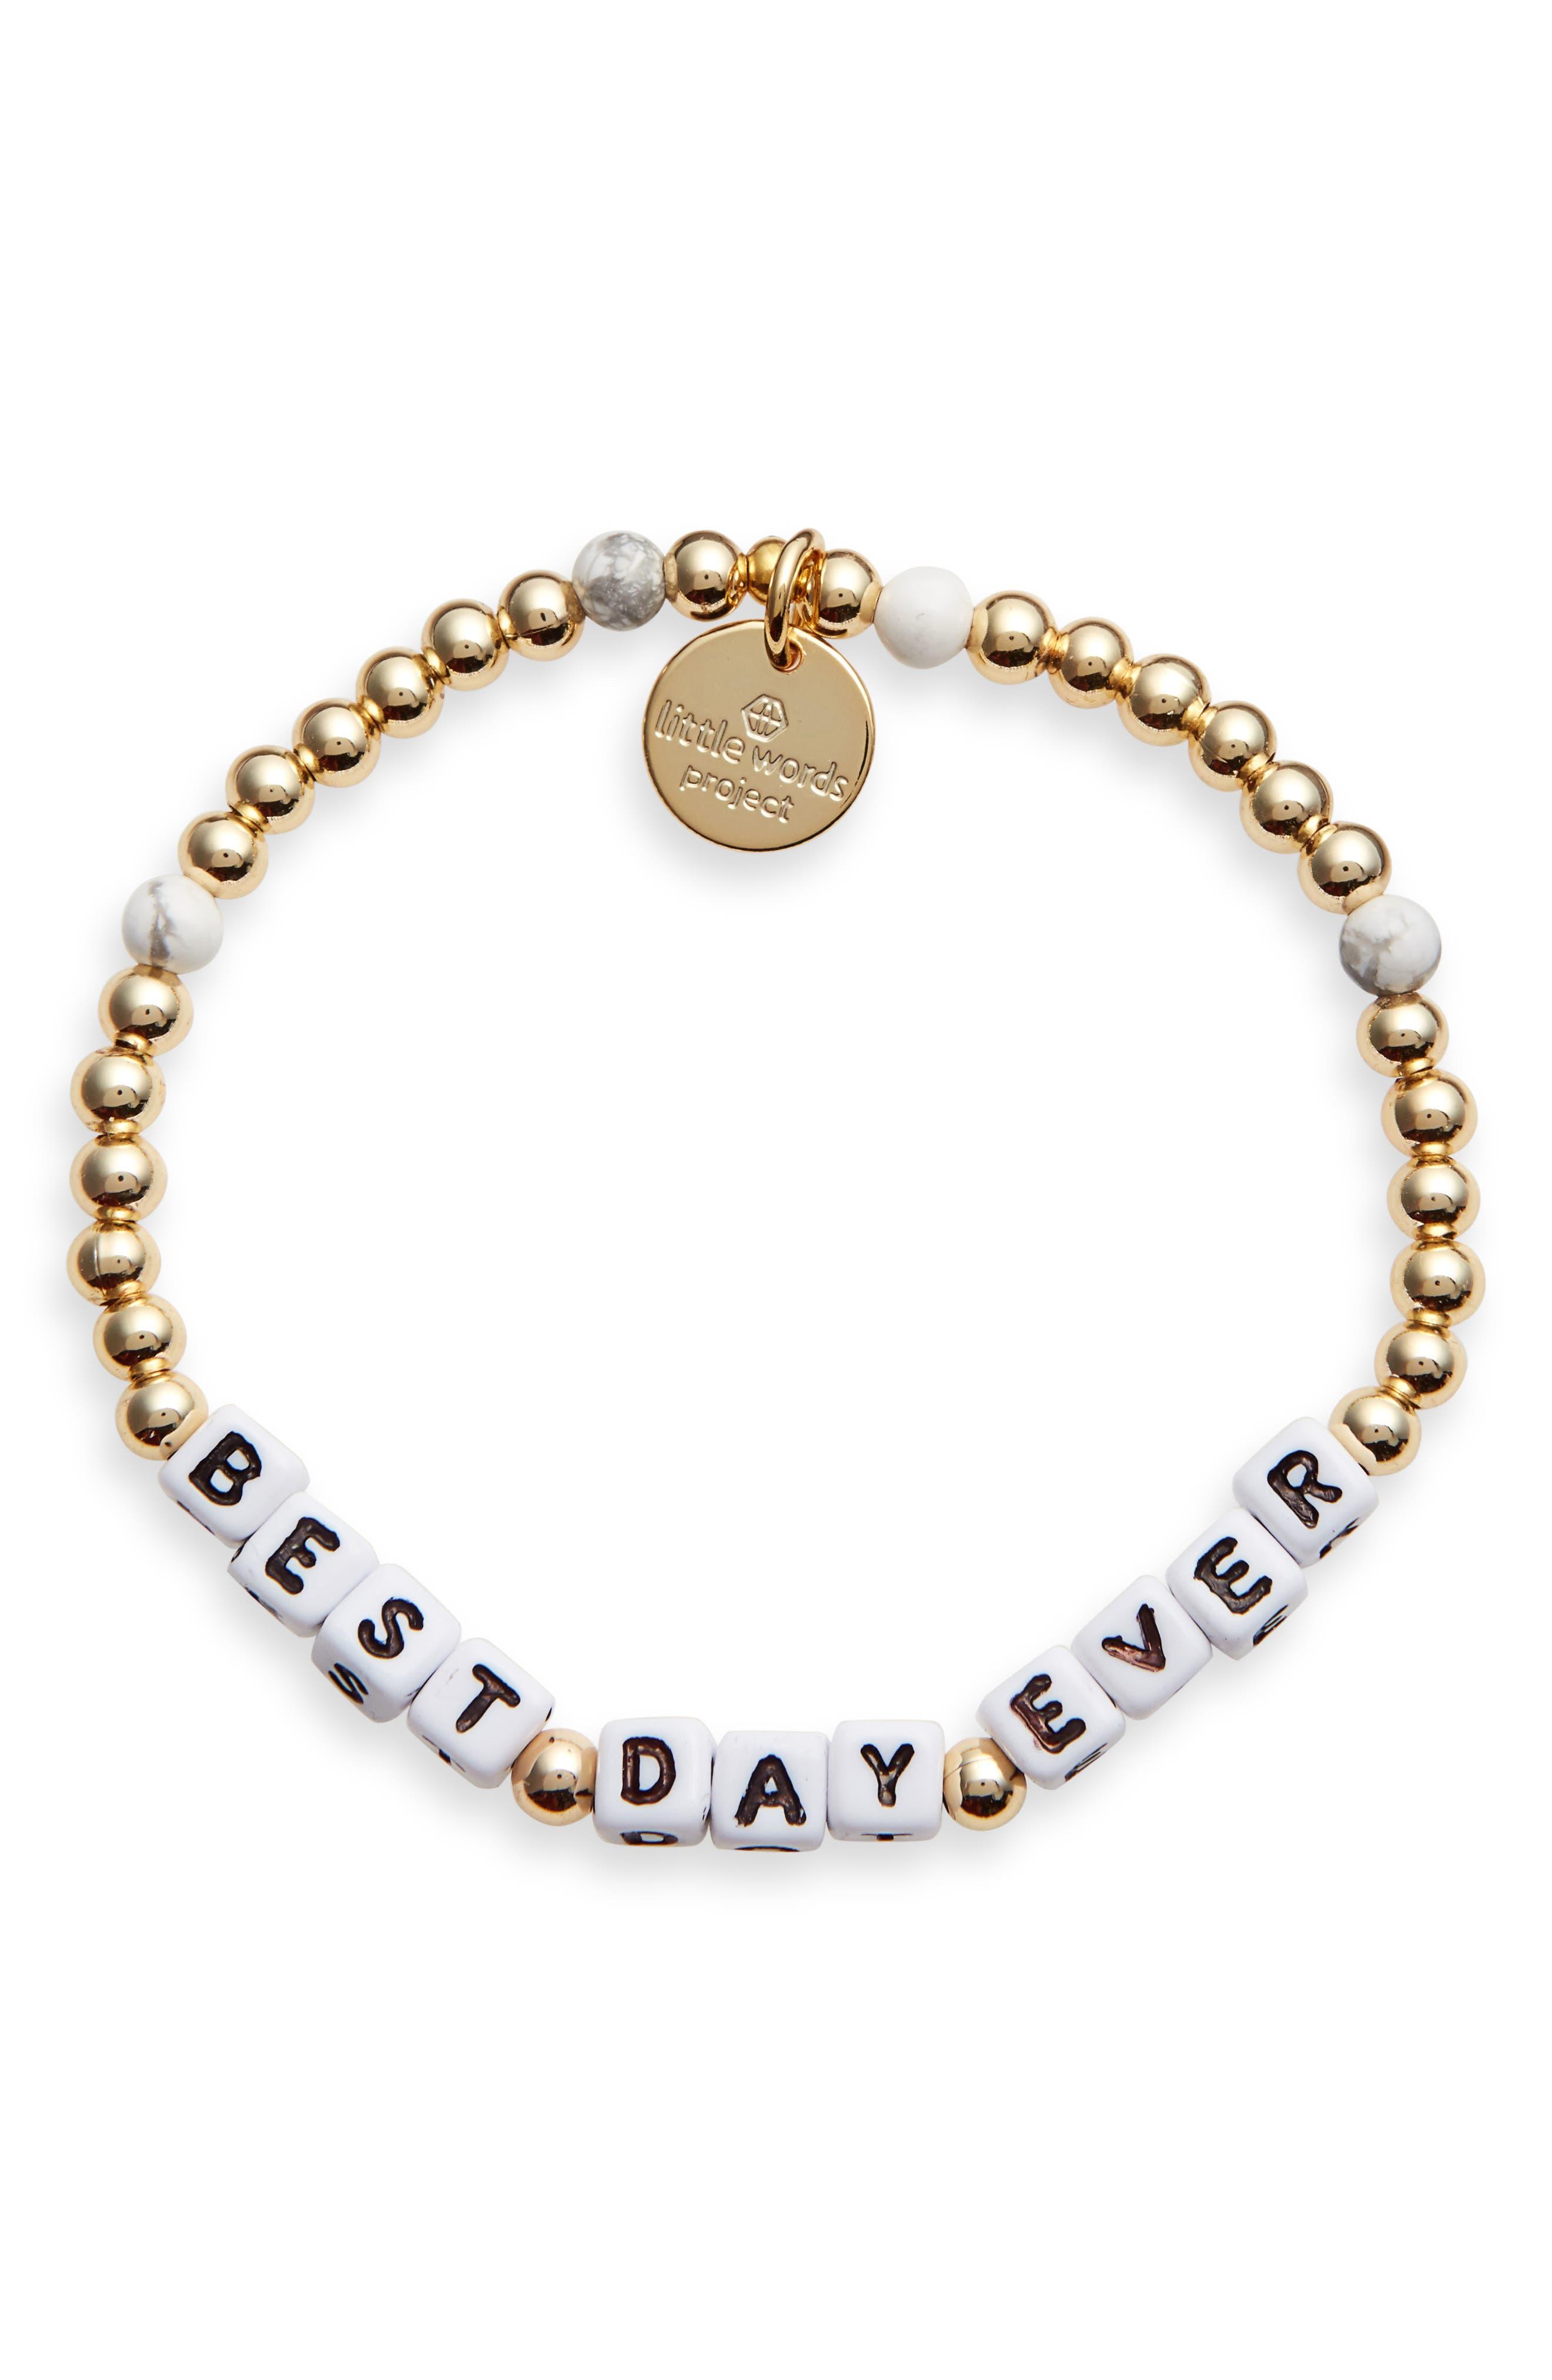 Best Day Ever Beaded Stretch Bracelet